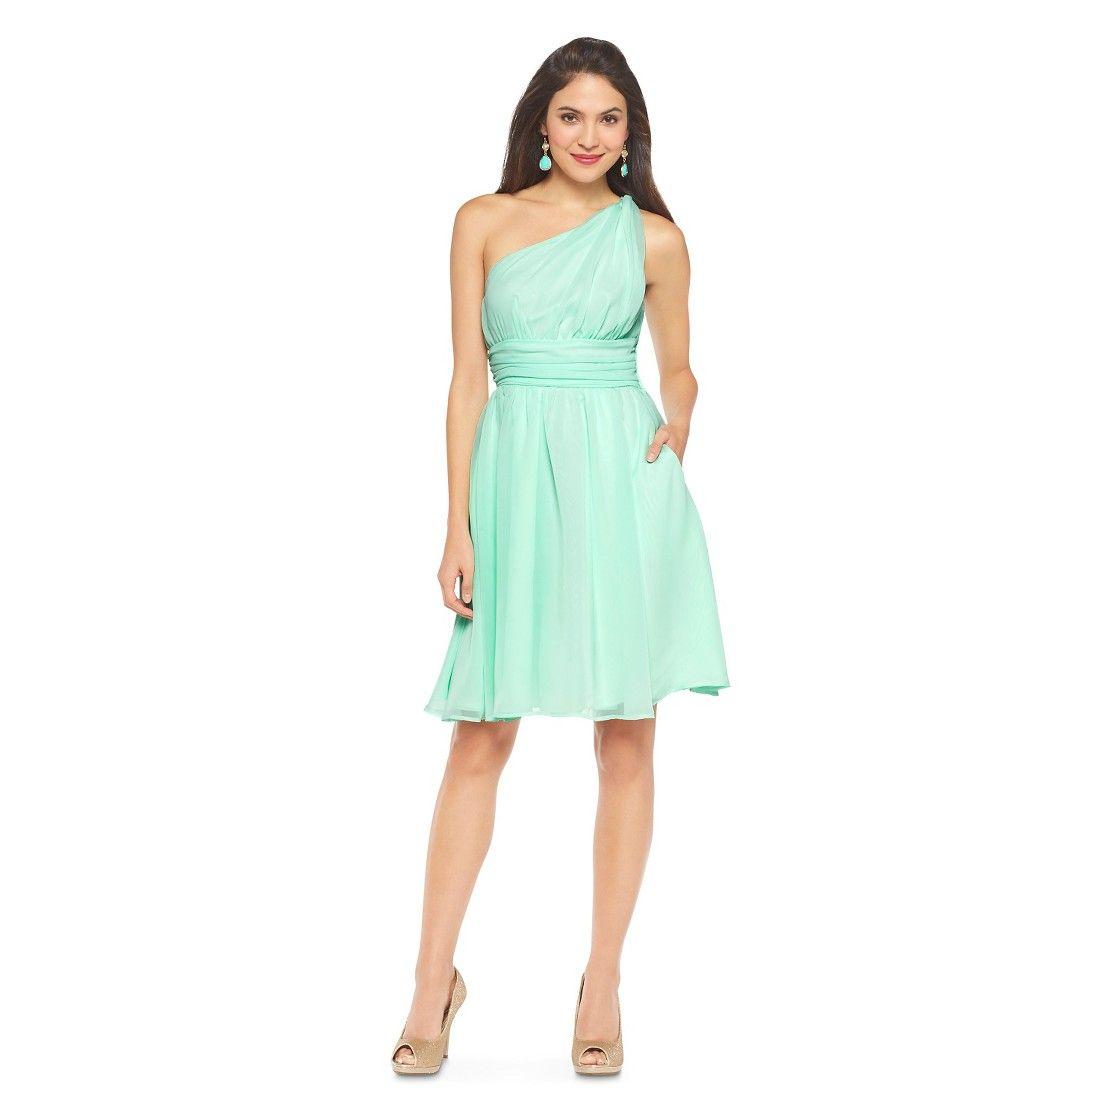 Womens one shoulder chiffon bridesmaid dress fashion colors womens one shoulder chiffon bridesmaid dress fashion colors tevolio ombrellifo Gallery